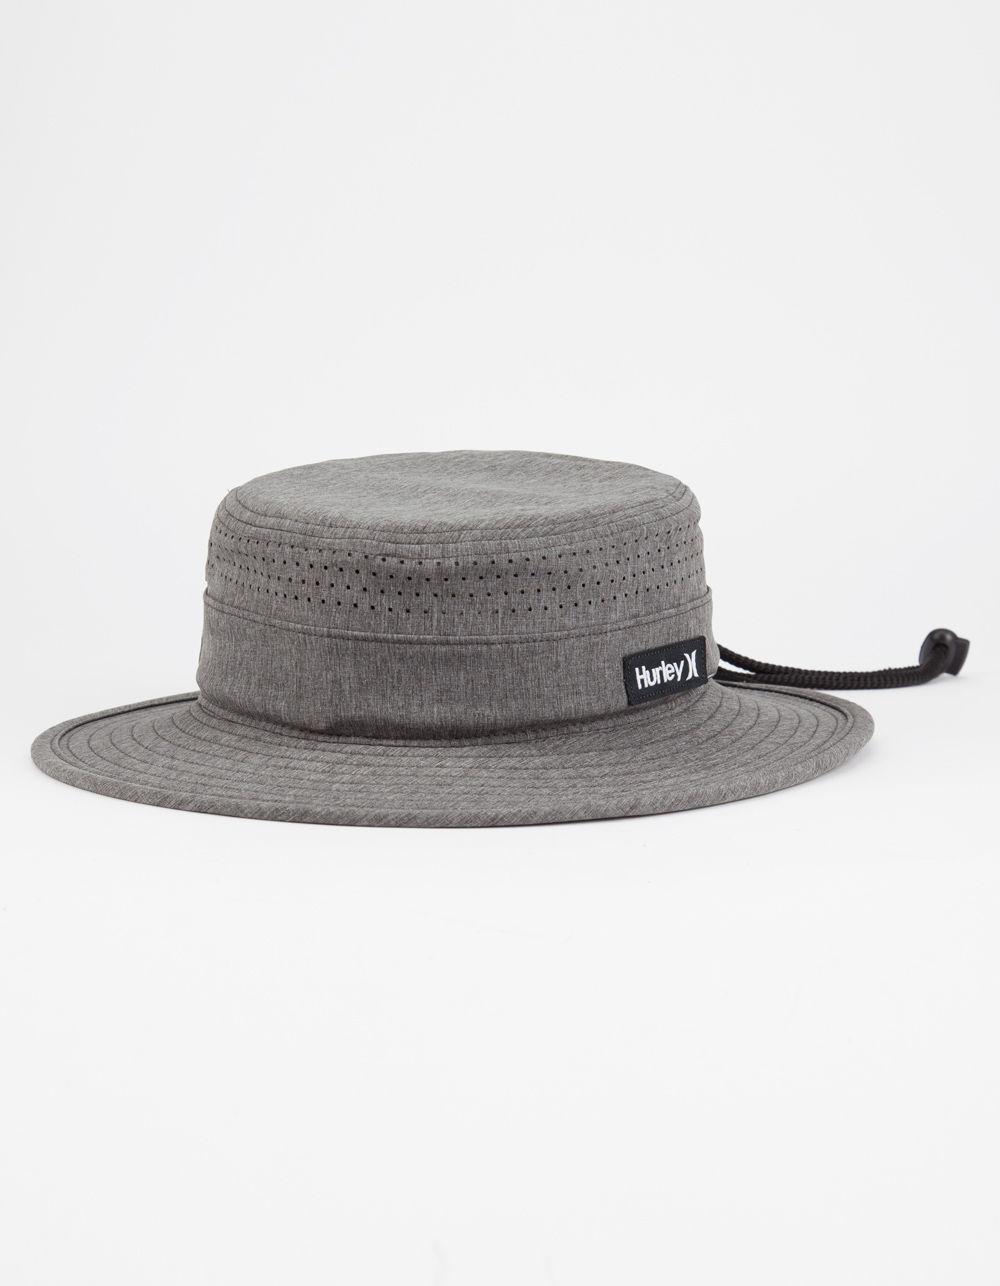 ... new arrivals lyst hurley surfari bucket hat in black for men 3e614 ef7a4 c667d515175